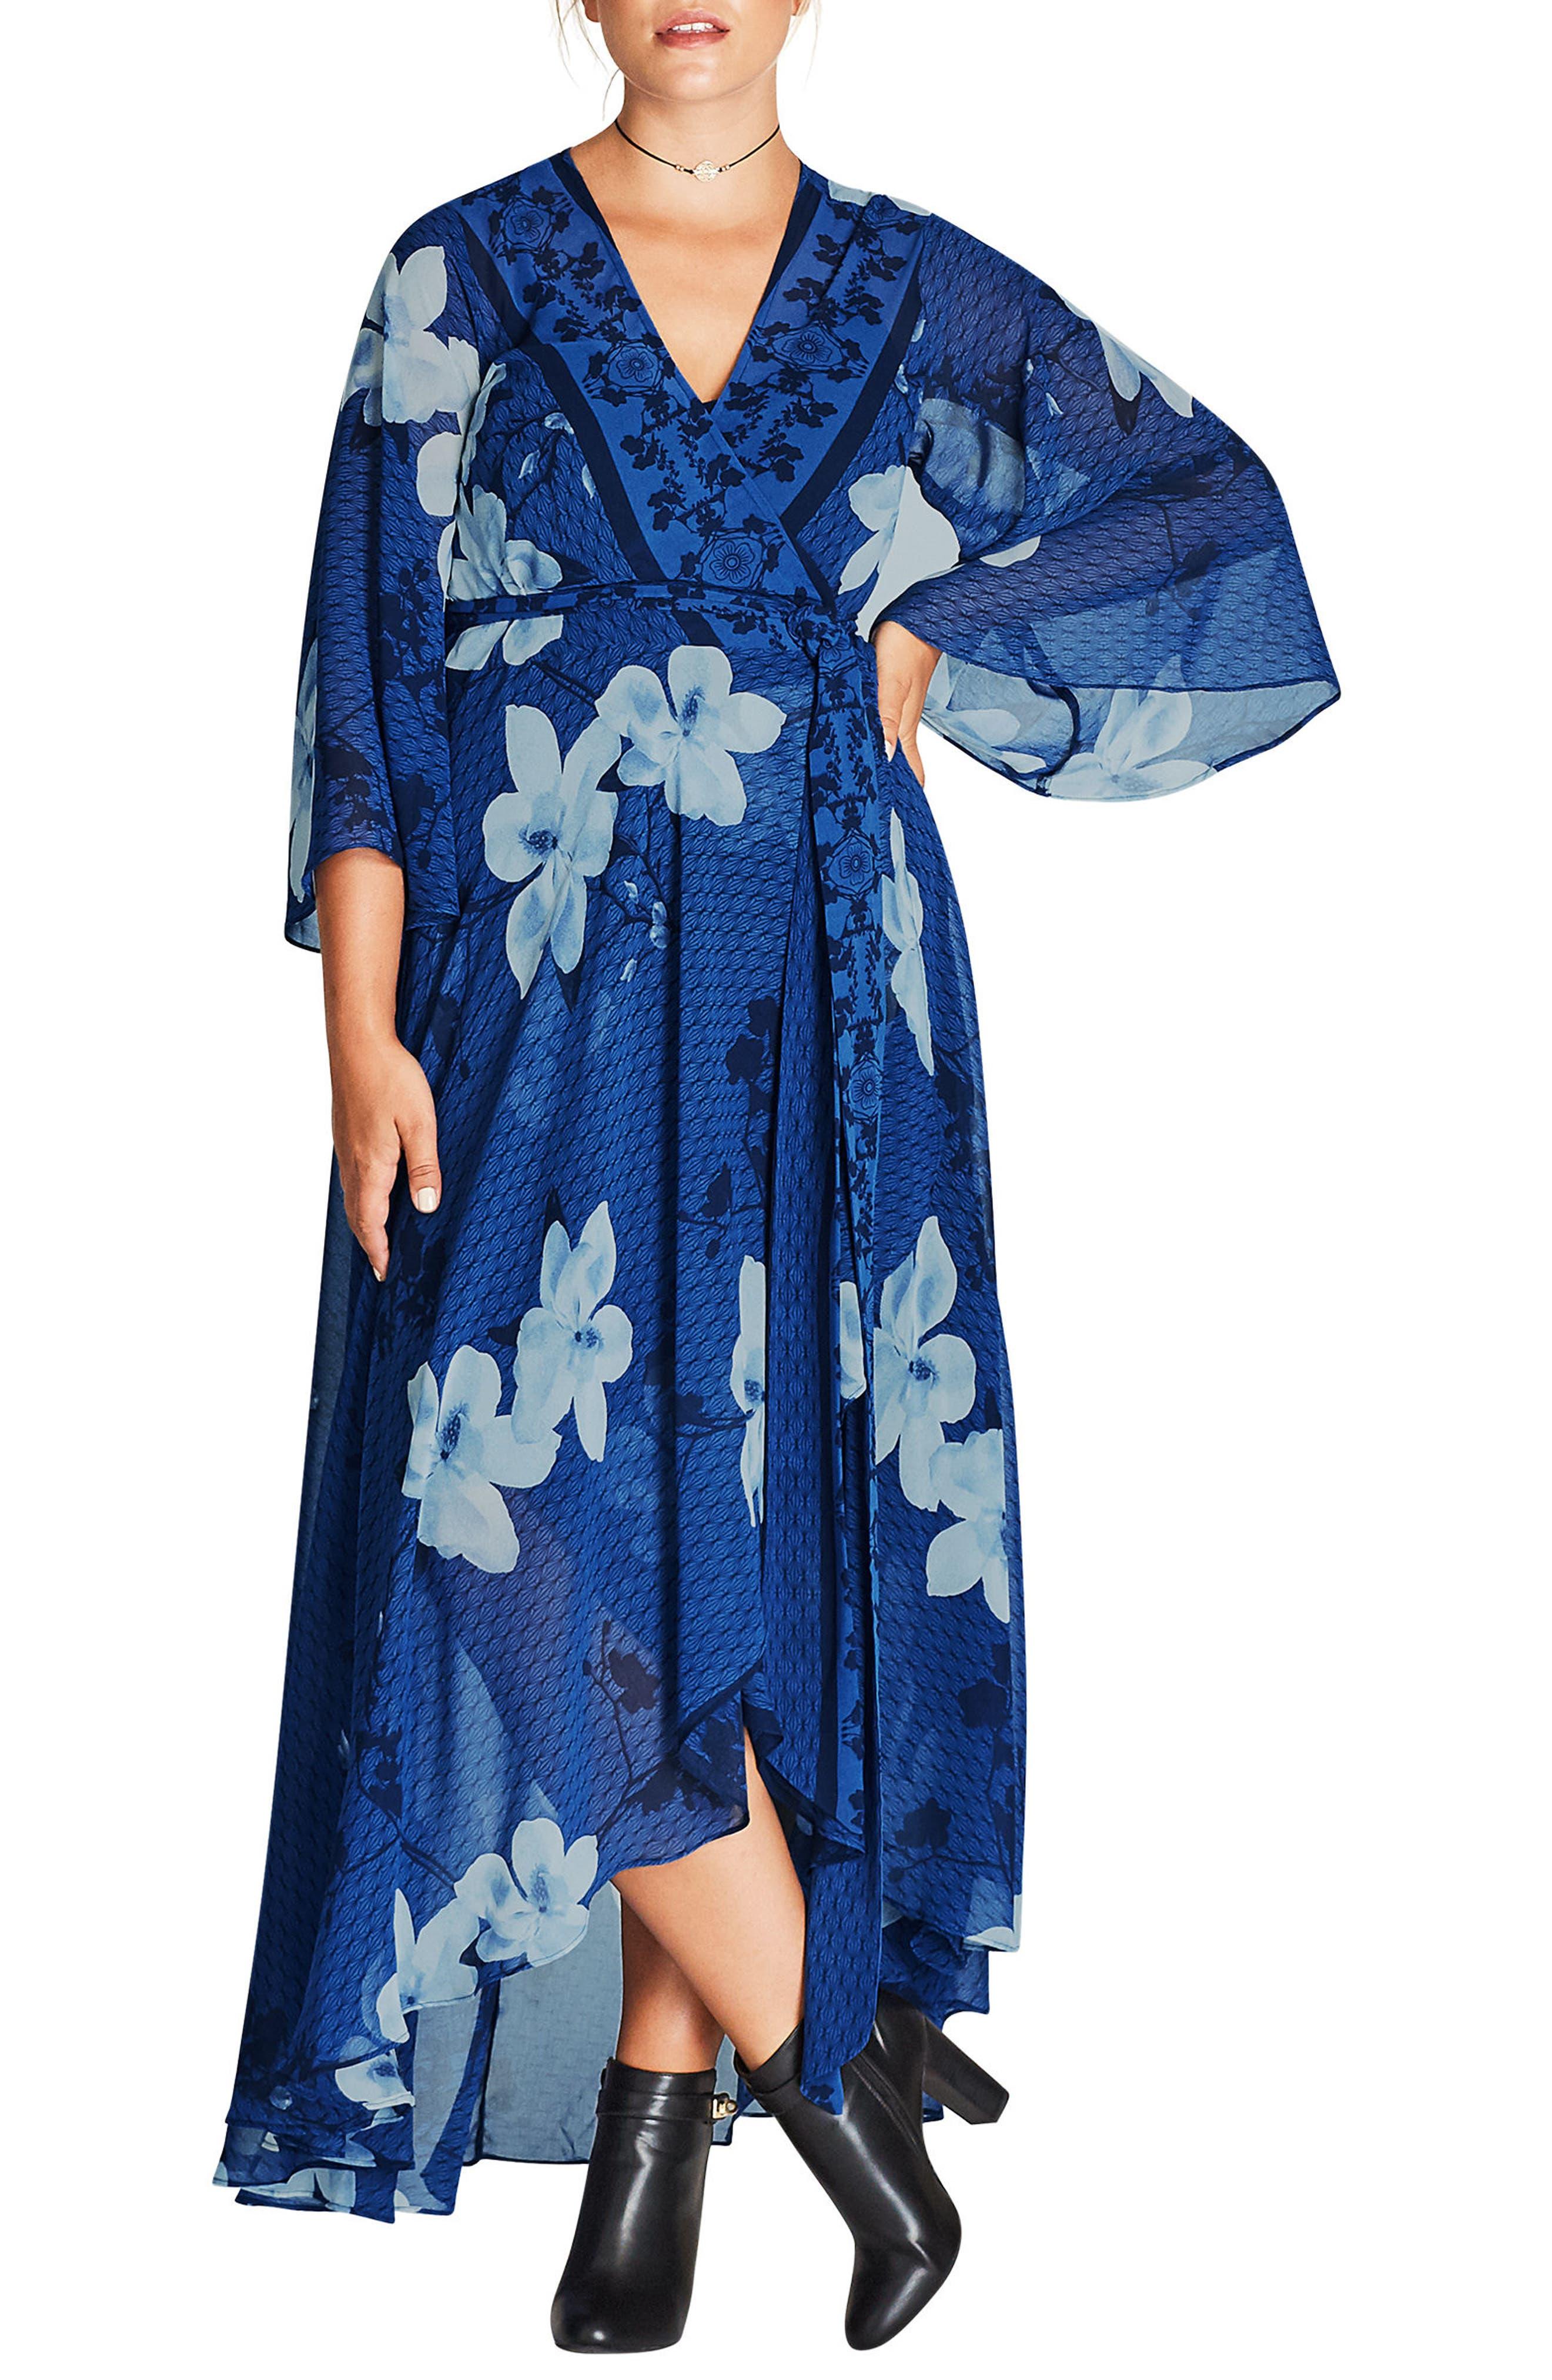 Main Image - City Chic Blue Magnolia Maxi Wrap Dress (Plus Size)